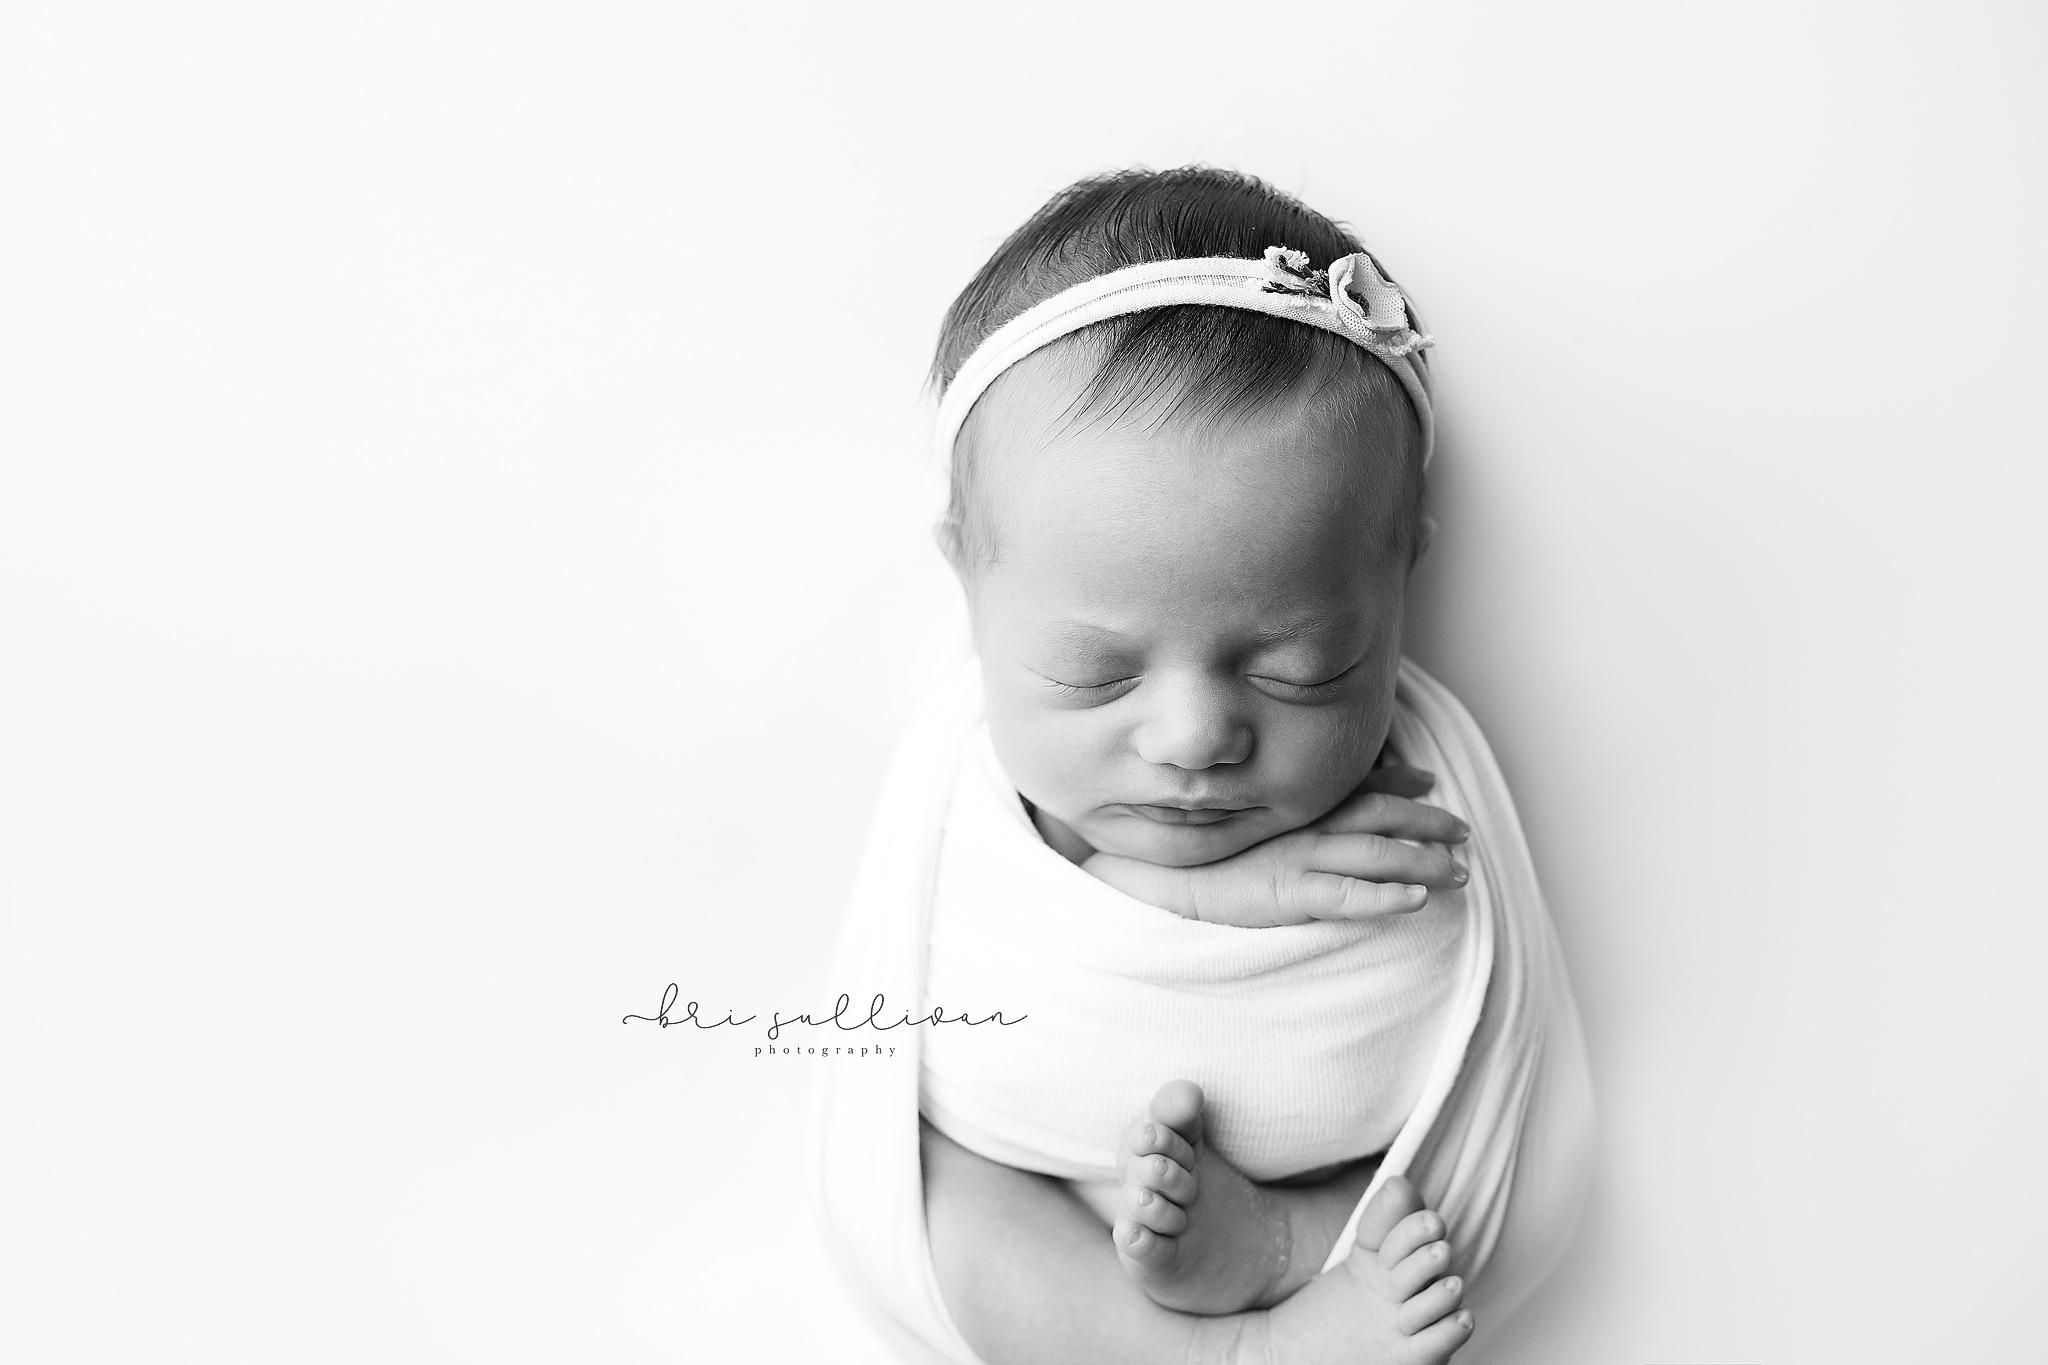 Houston Baby Photography by Bri Sullivan by cherrystreetphoto